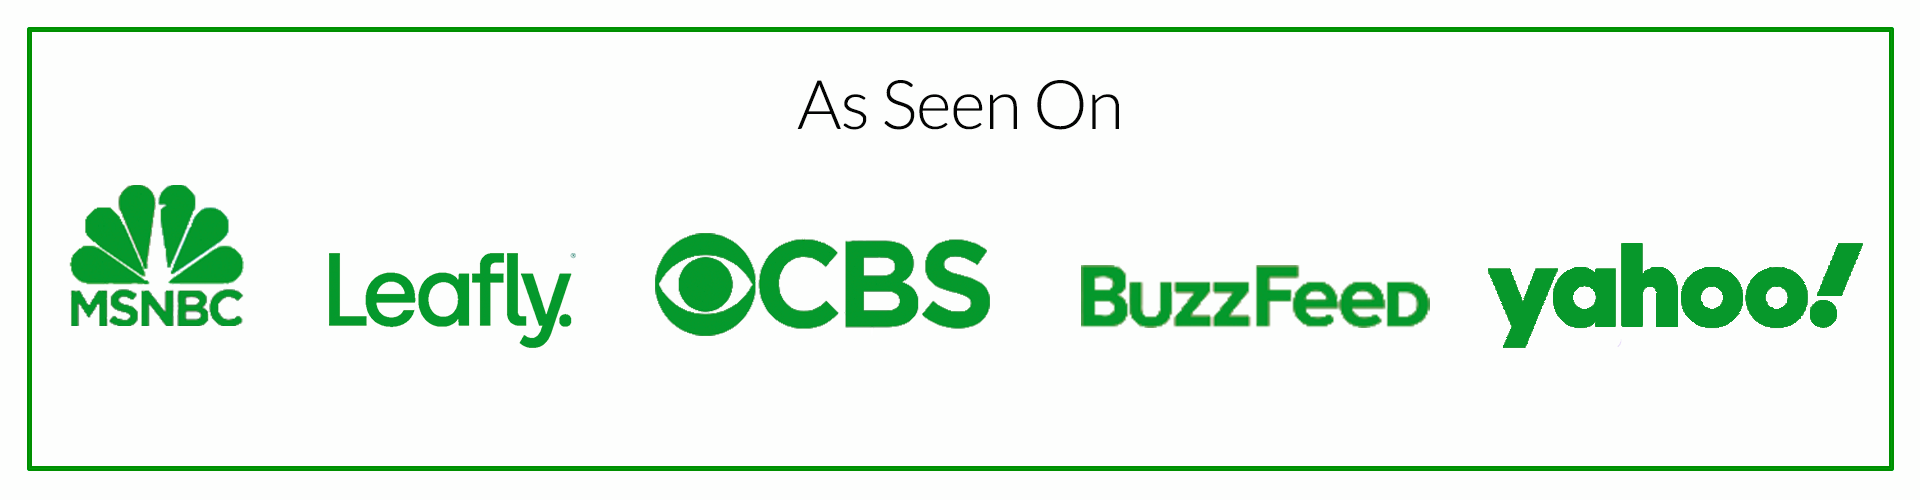 all-media-logos-green-f2.png